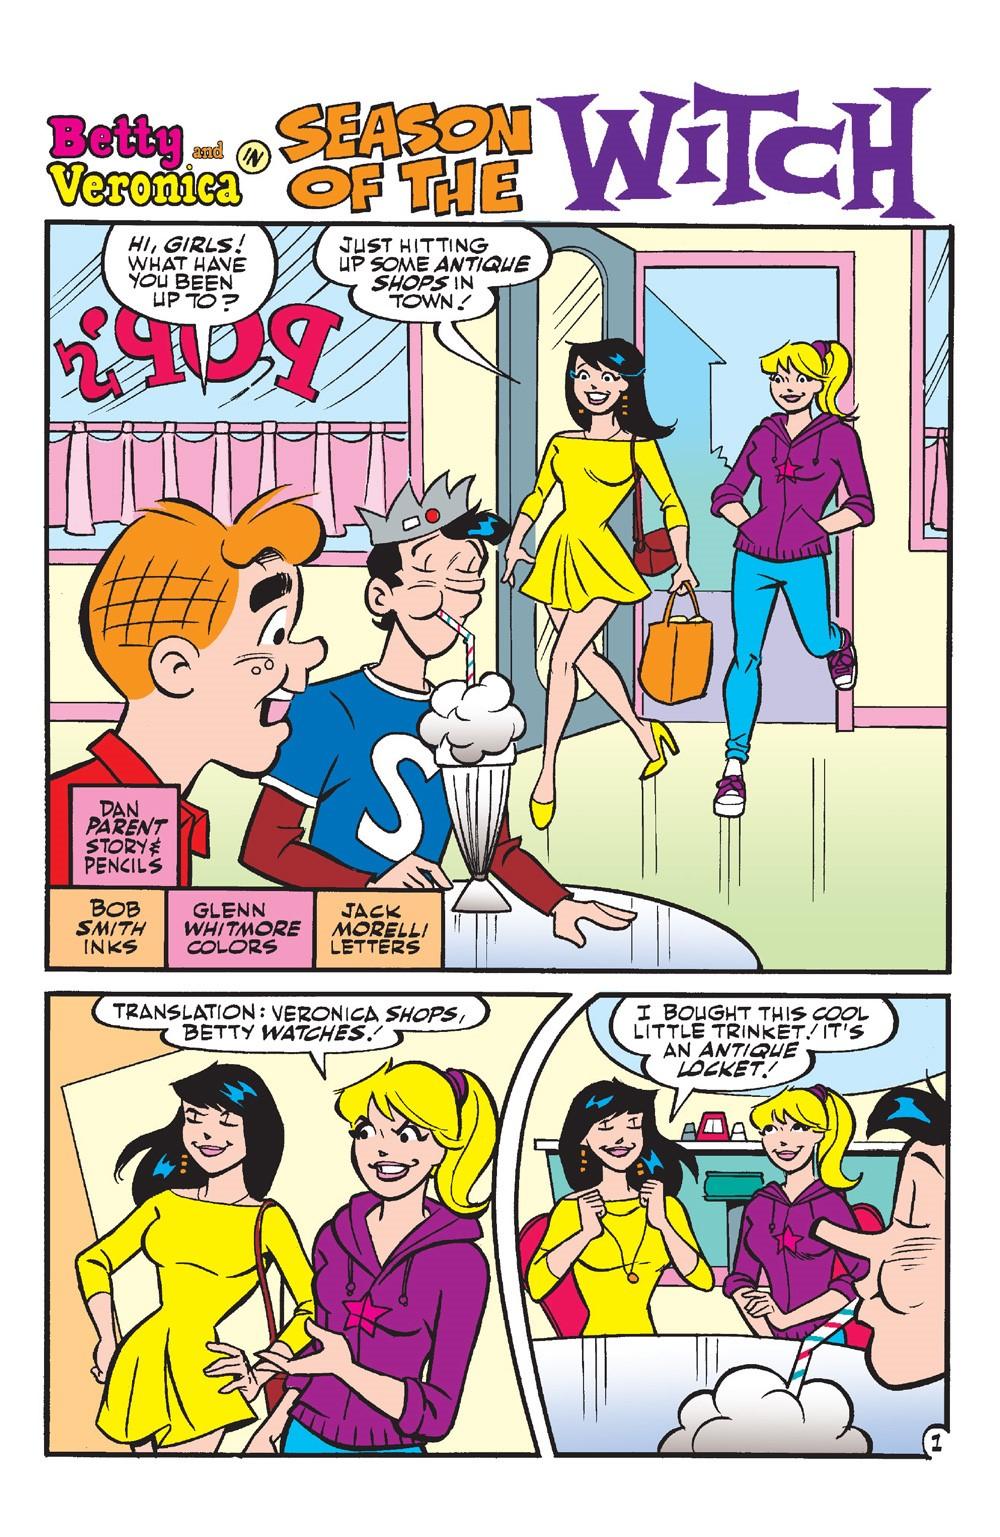 ArchieHalloweenSpectacular_01-8 ComicList Previews: ARCHIE HALLOWEEN SPECTACULAR #1 (2021)